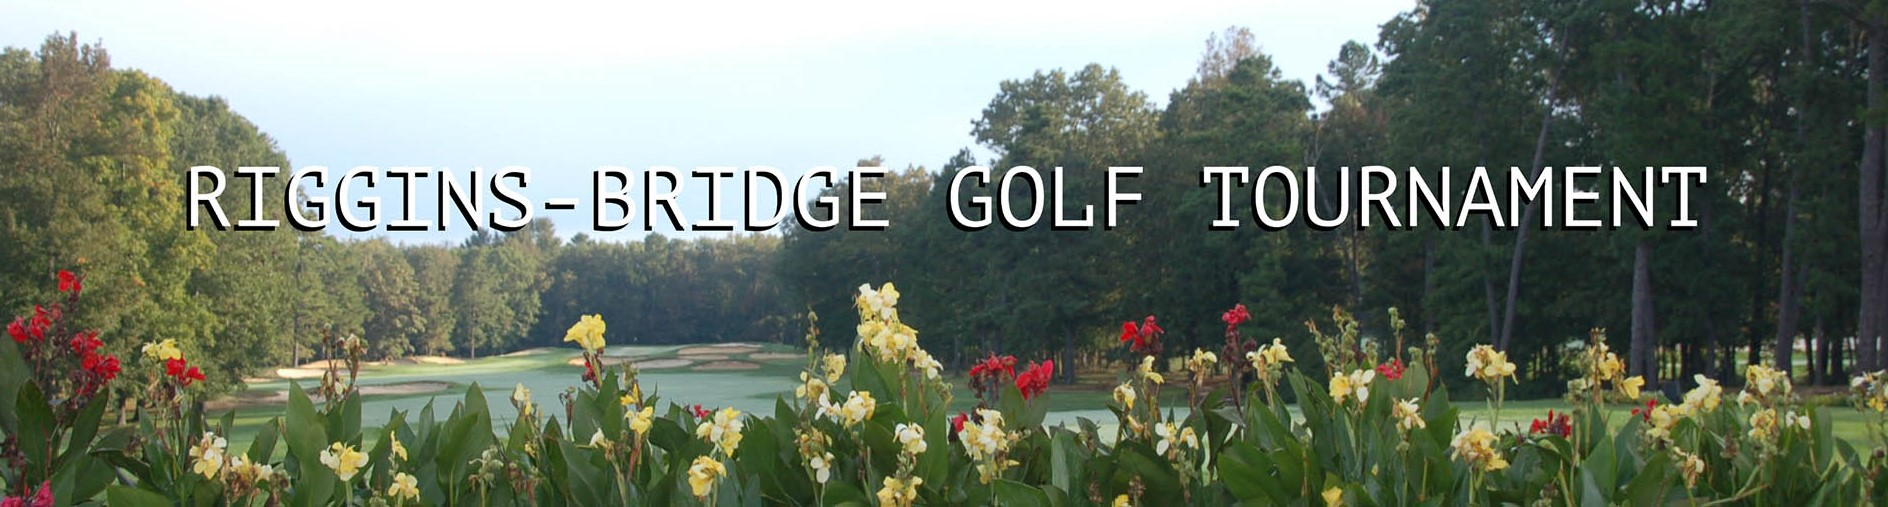 Riggins-Bridge Golf Tournament benefitting the Garden State Council, BSA